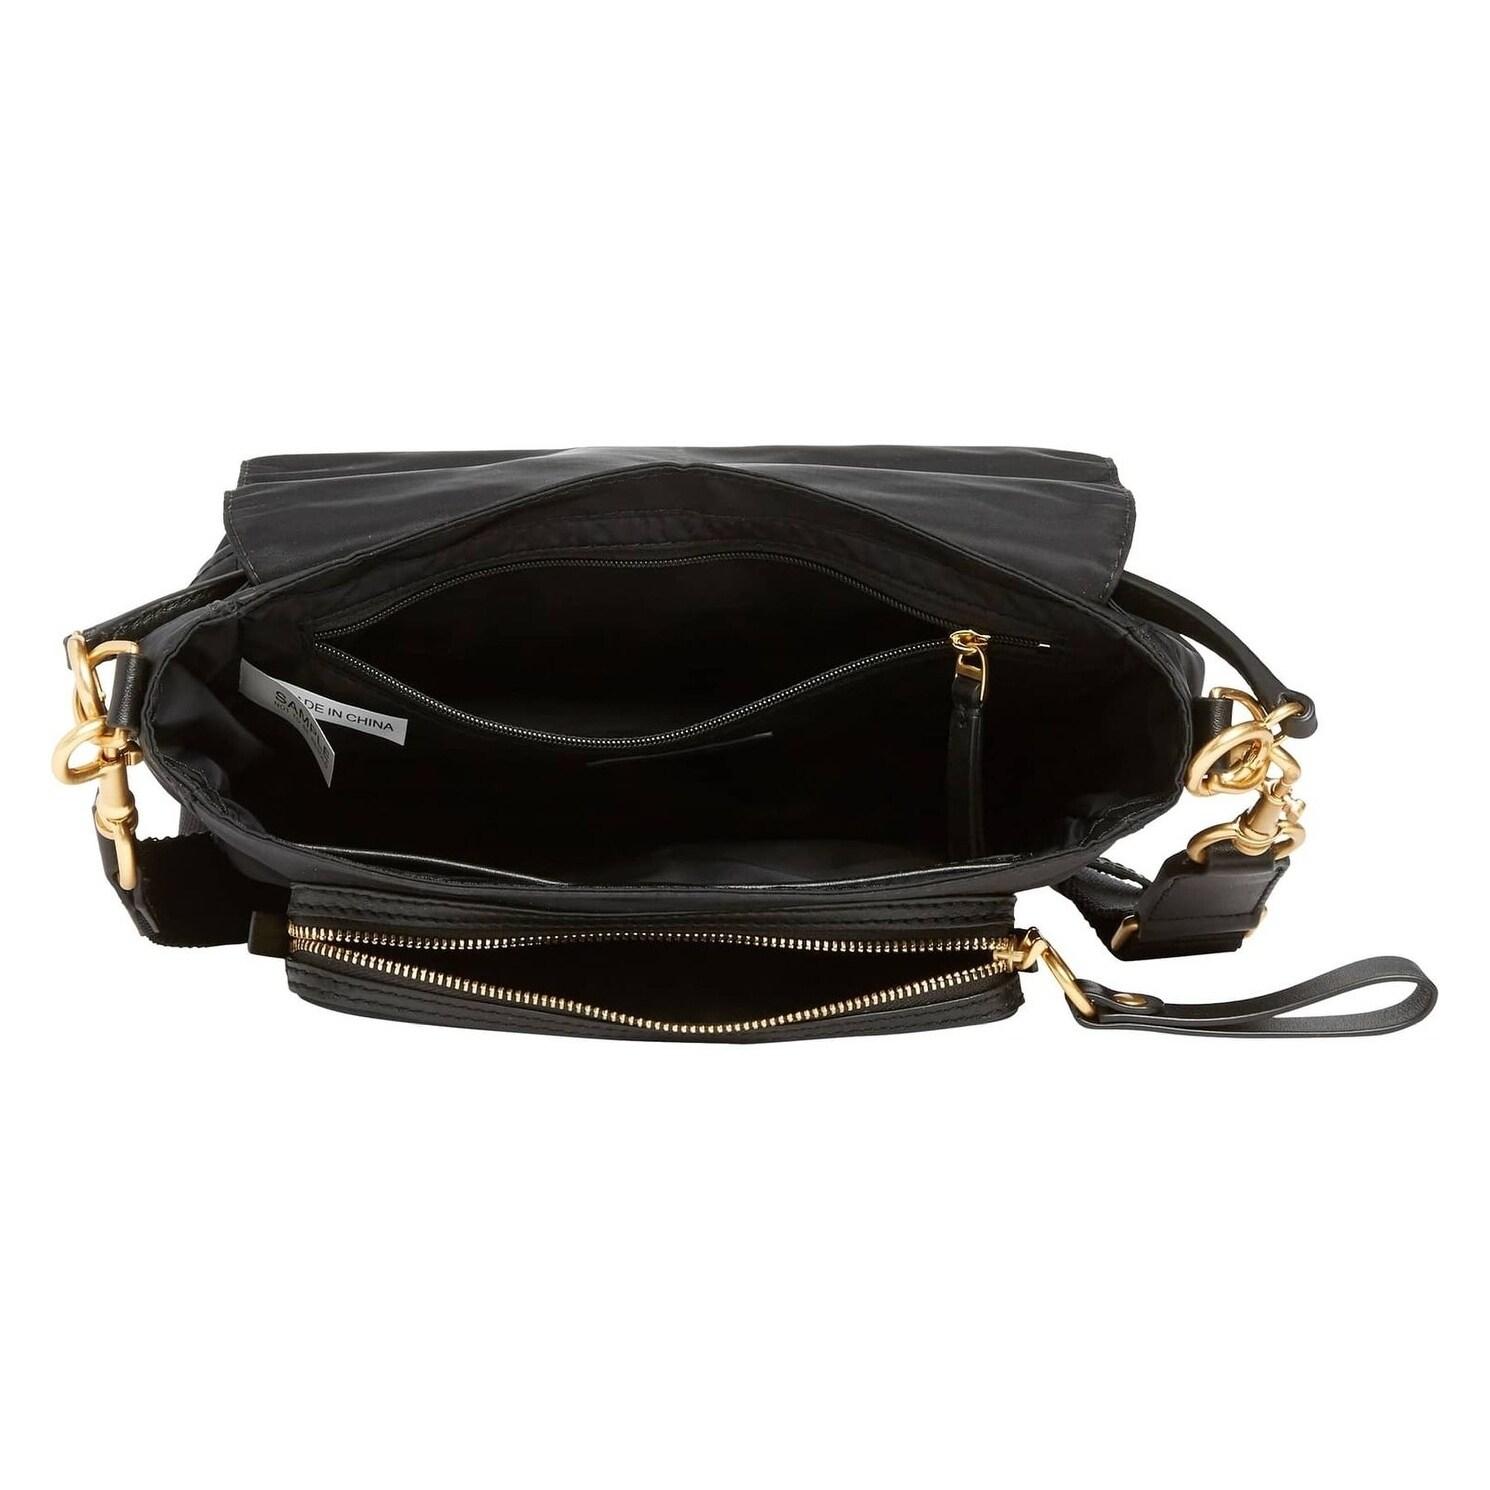 695aaf32ac72 Shop Tory Burch Tilda Nylon Crossbody Bag Black - Free Shipping Today -  Overstock - 23449864